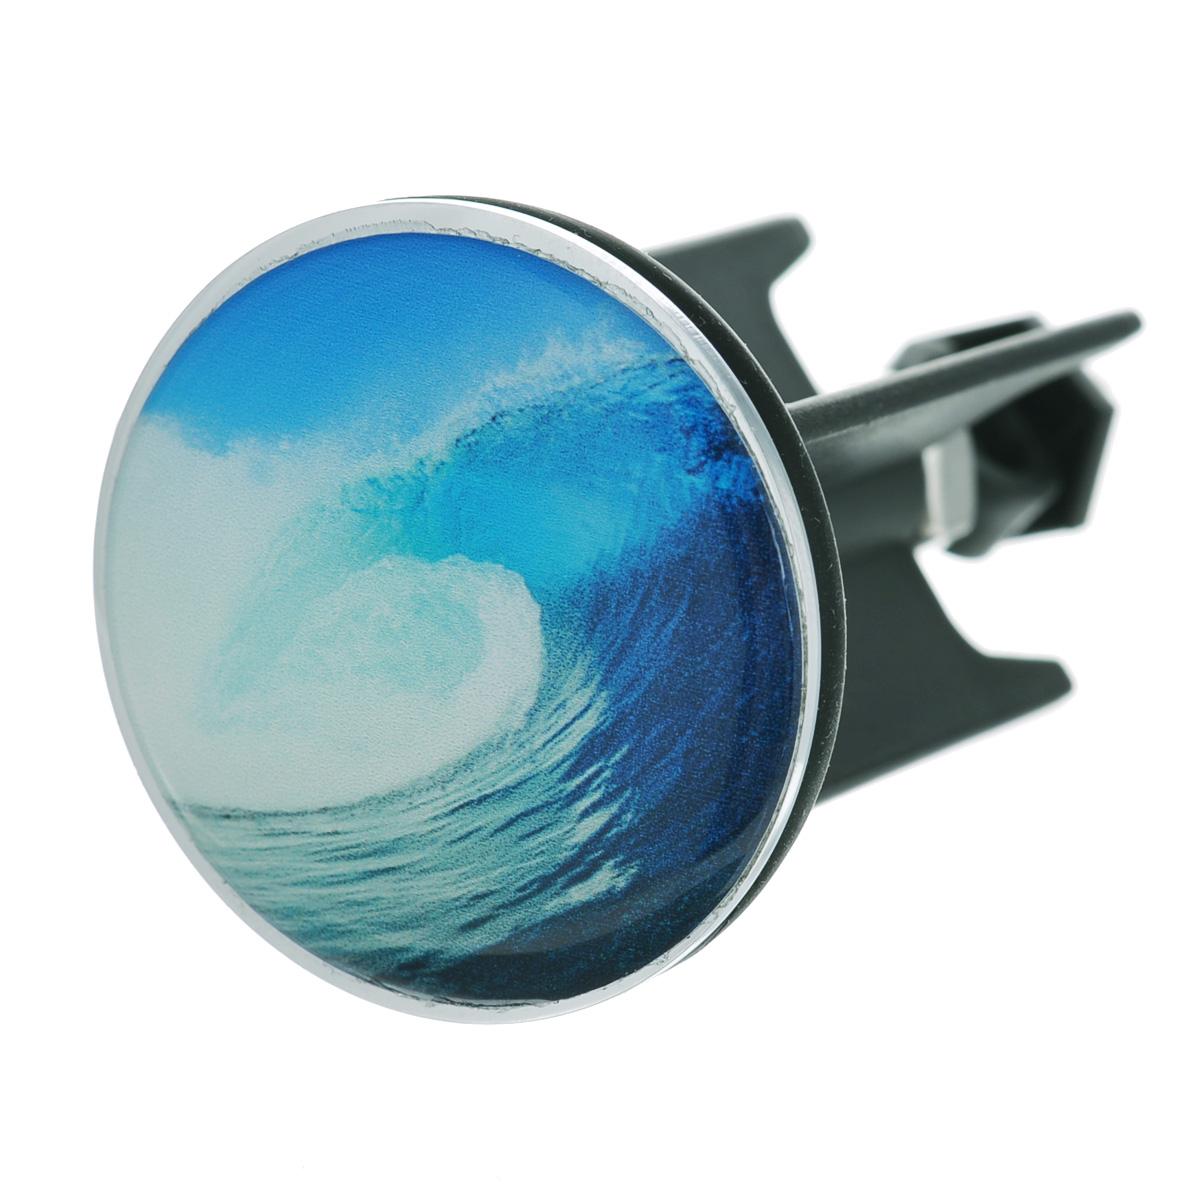 Пробка для раковины Wenko Wave, диаметр 4 см20767100